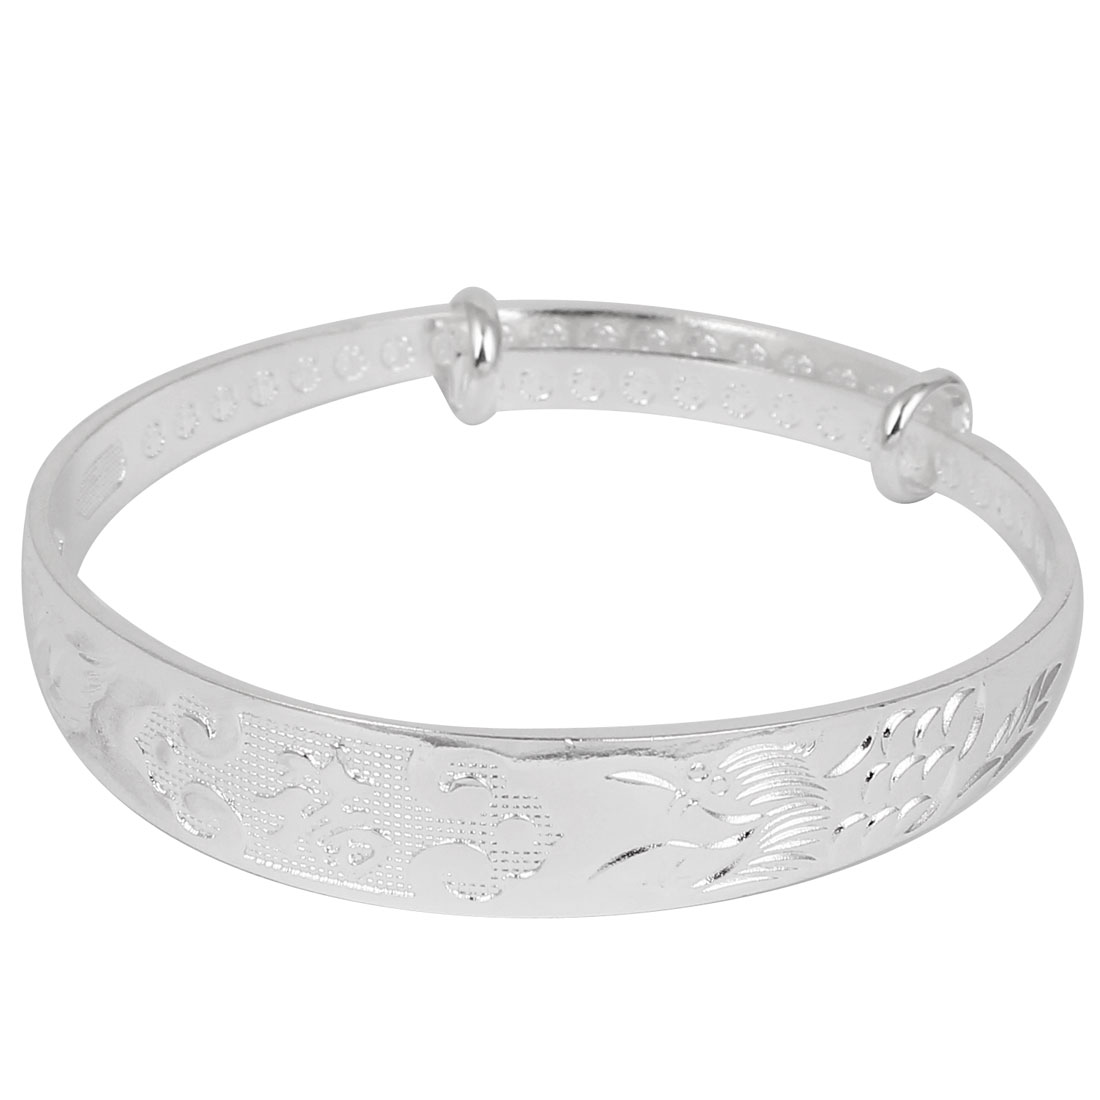 Women Metal Adjustable Push-Pull Style Wrist Decor Bracelet Bangle Silver Tone